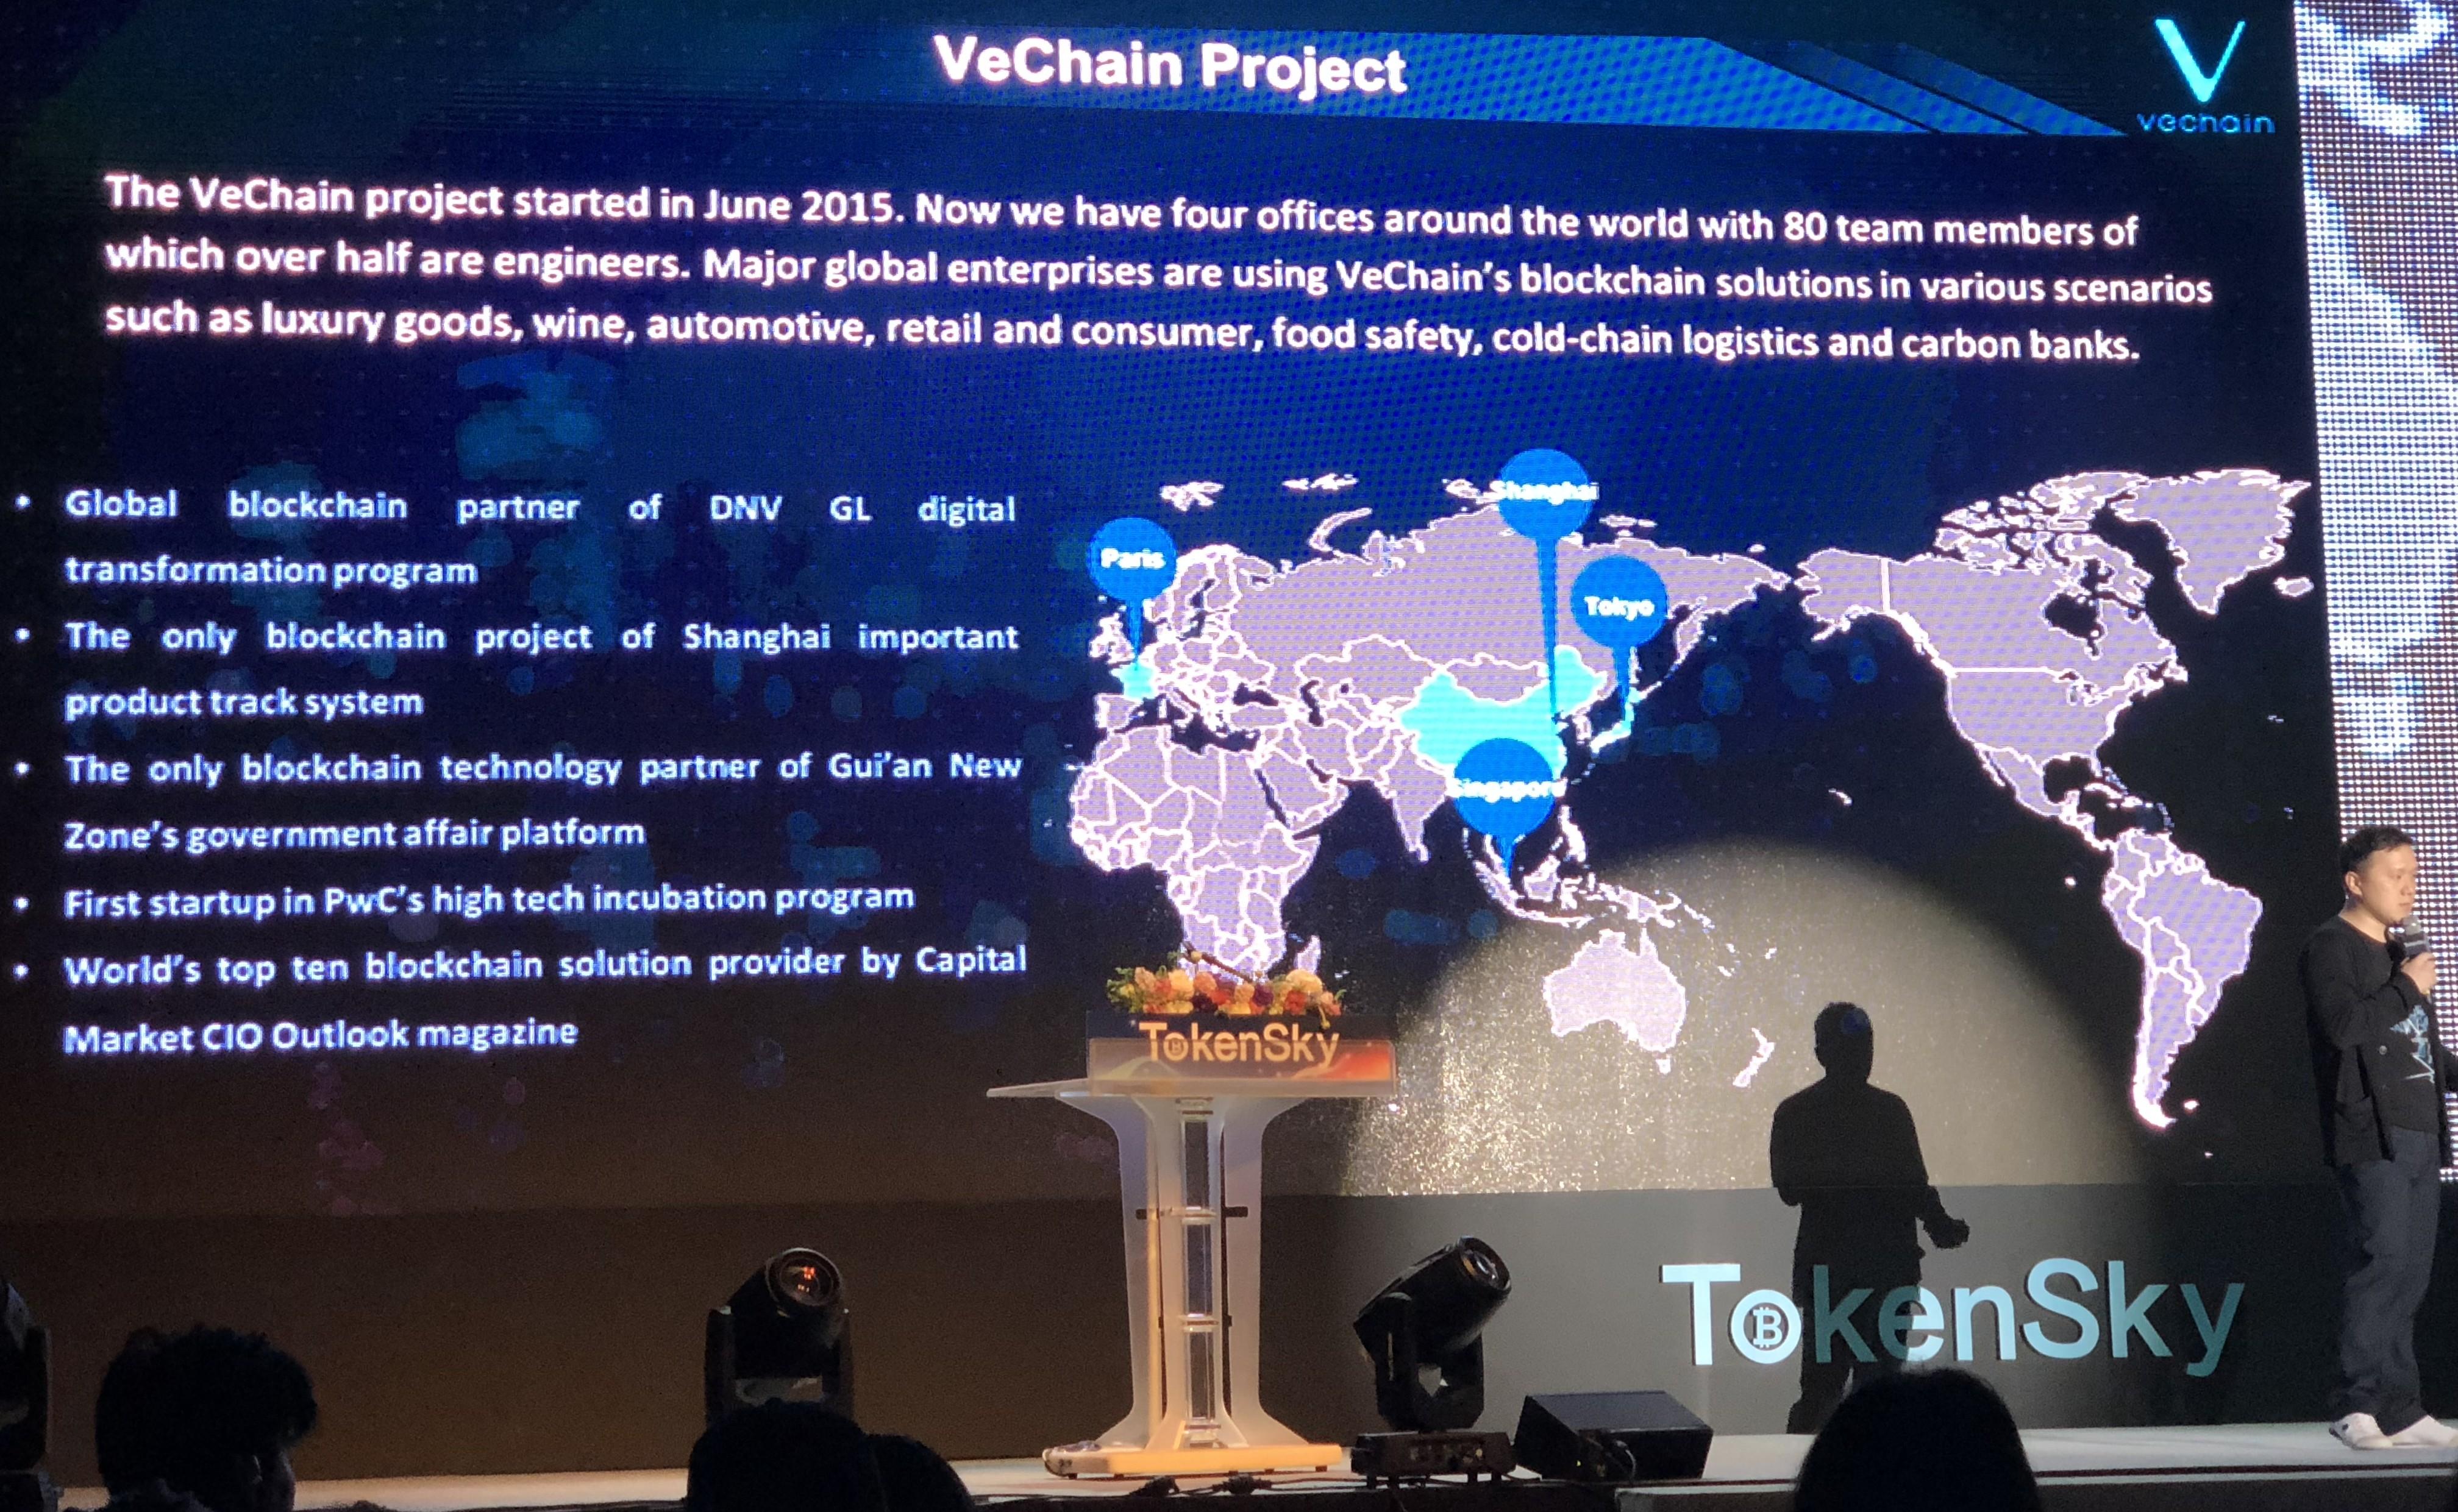 VeChain 首席运营官冯艺凯:唯链为企业大规模应用打造而打造的公有链平台